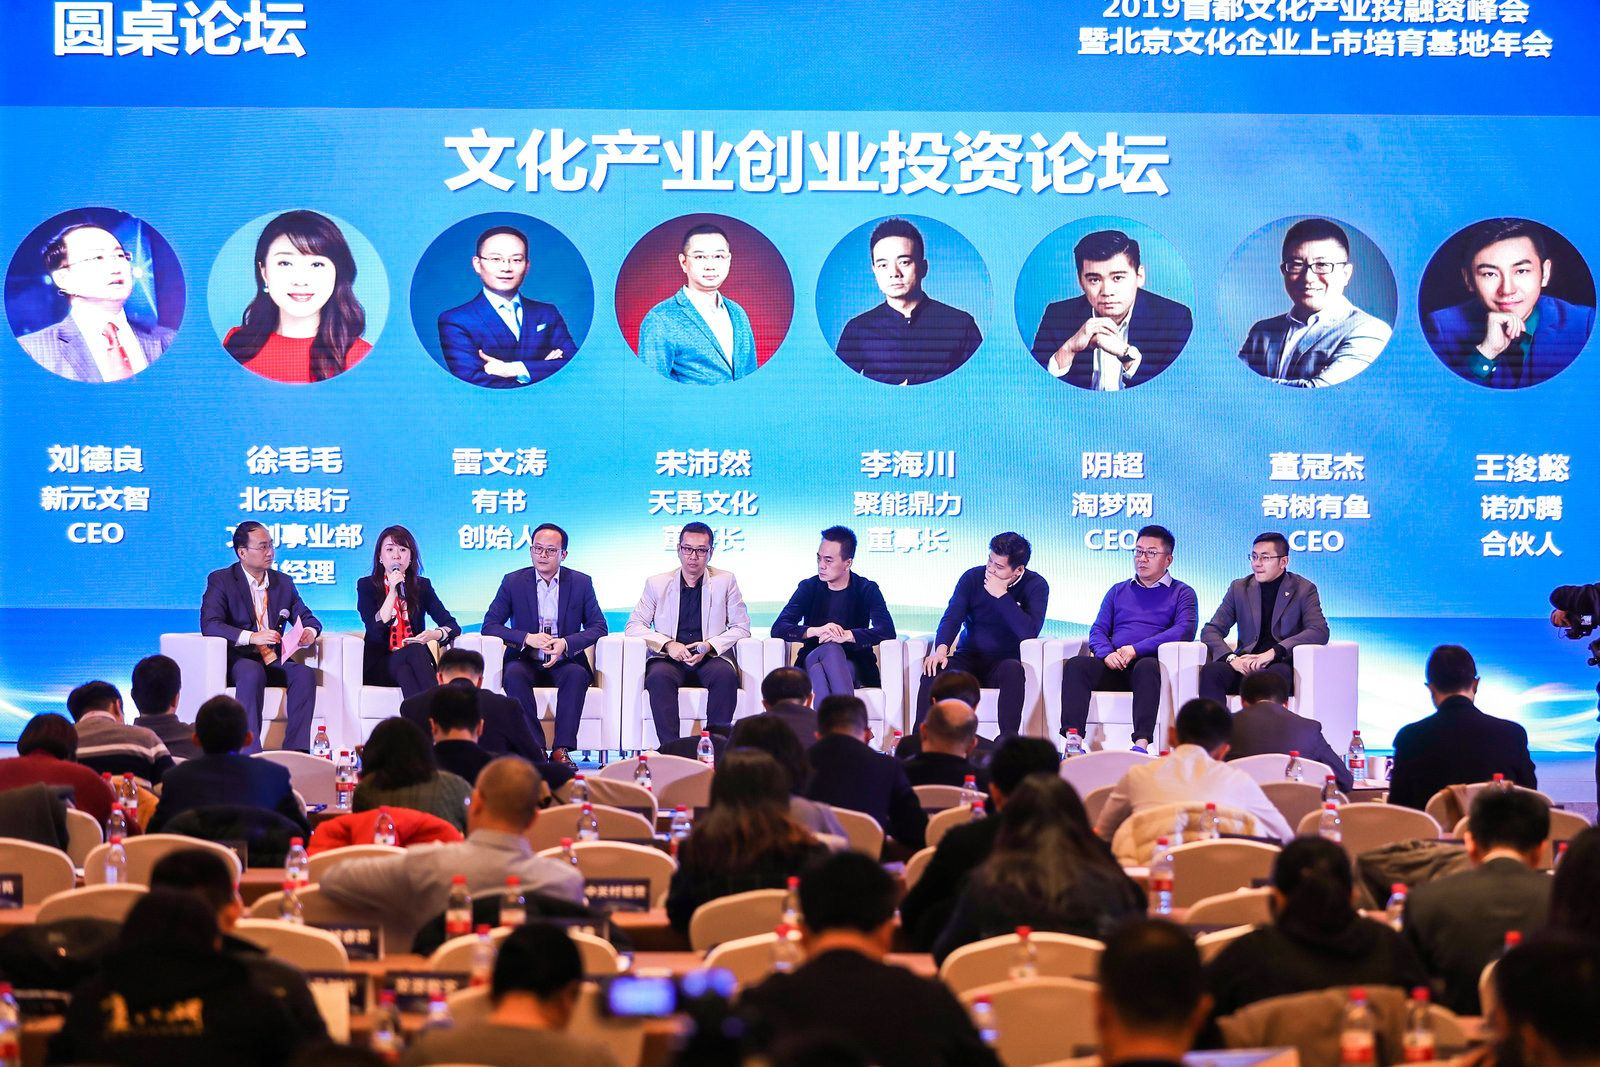 3344666.com全讯网 - 核桃编程完成B轮3.5亿人民币融资 1.5亿用于升级AI教学产品和技术